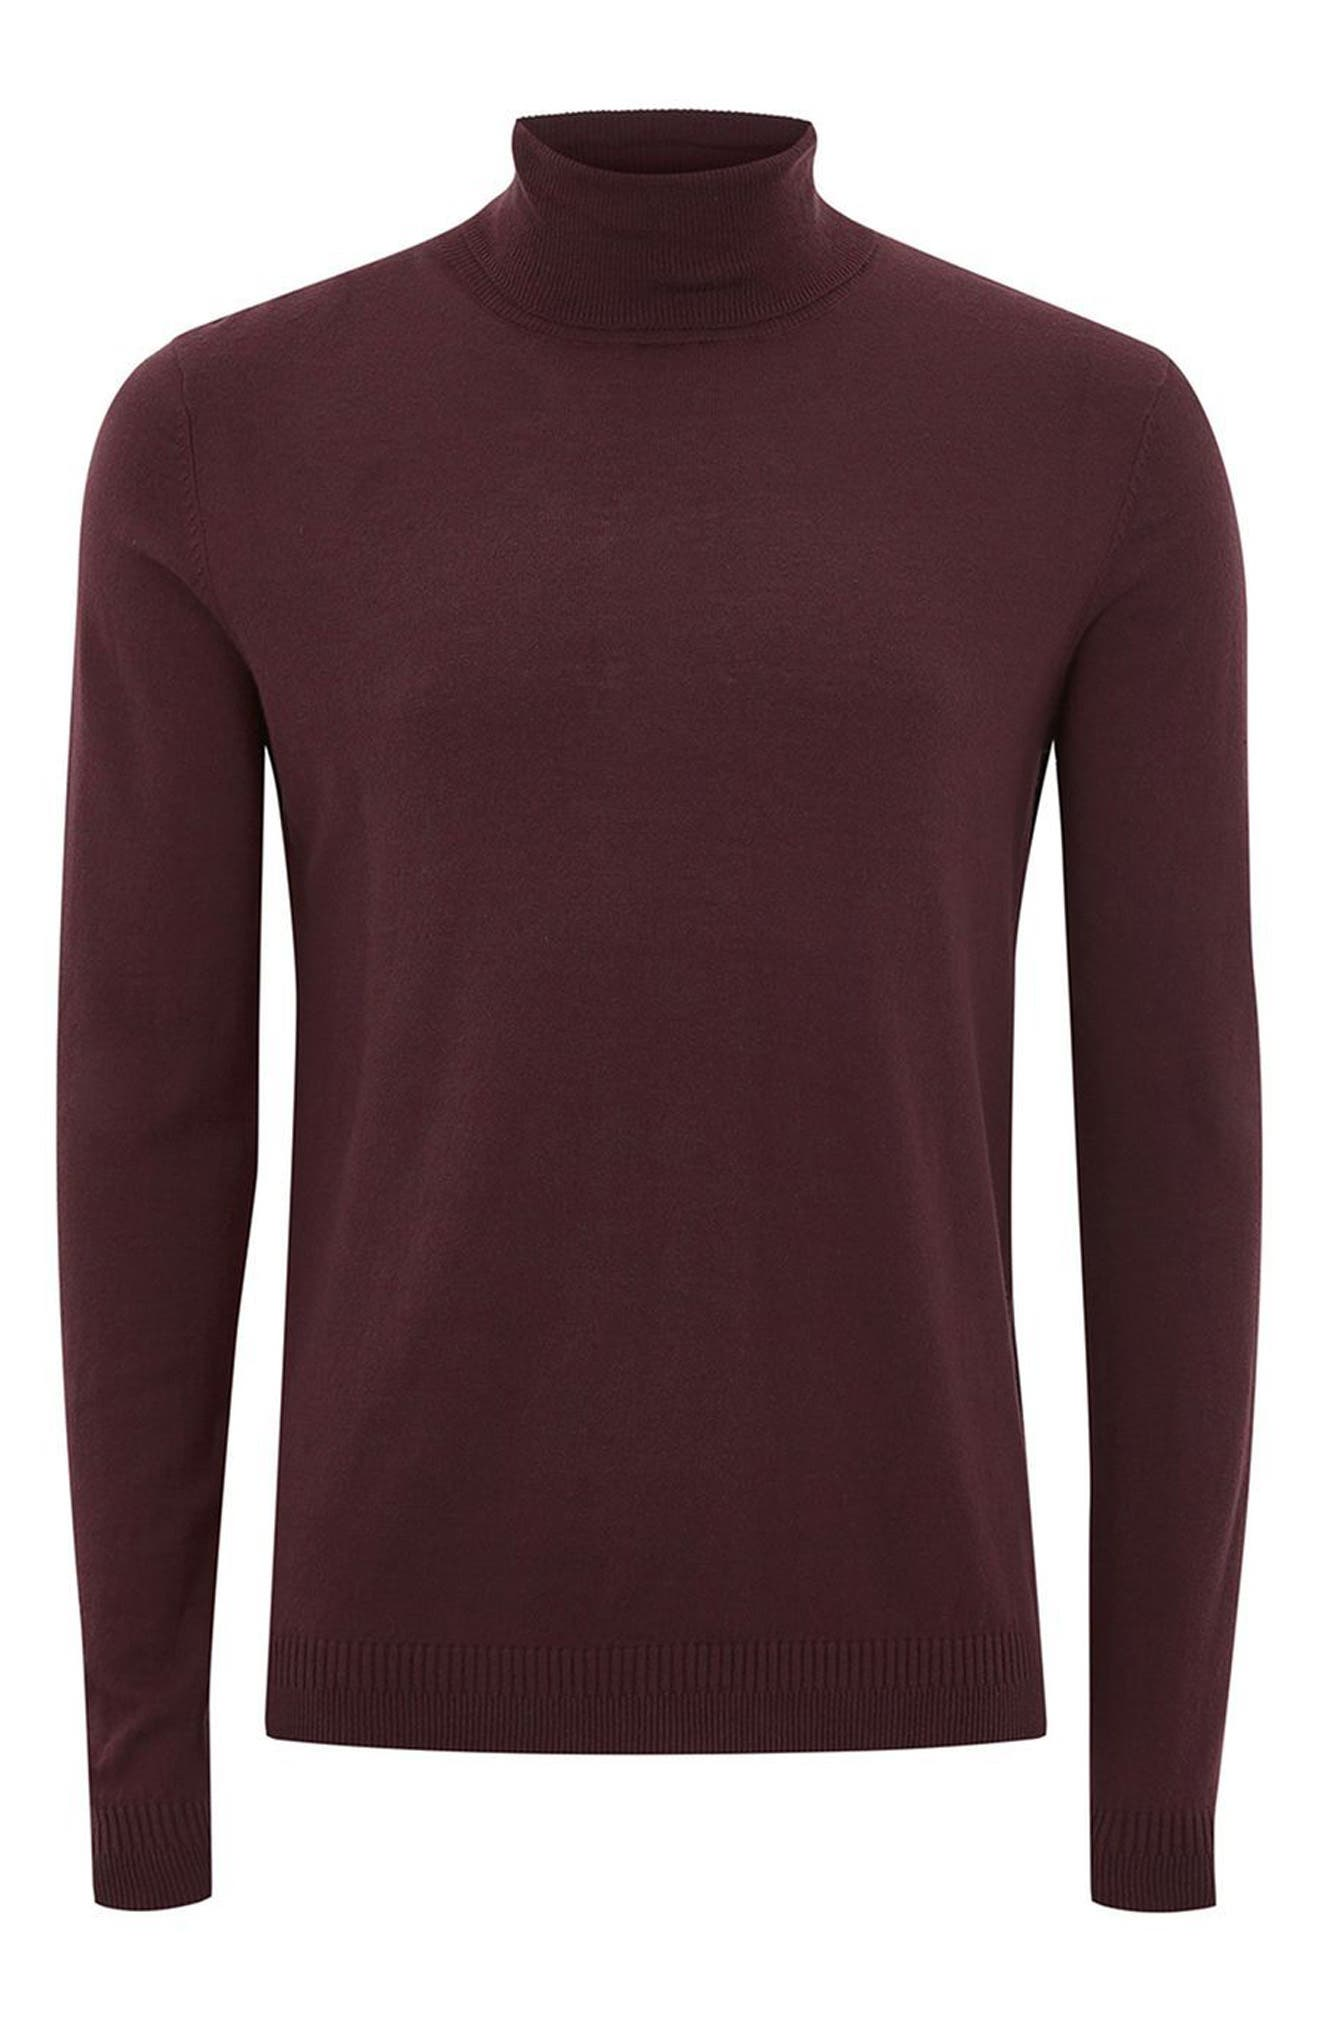 Cotton Turtleneck Sweater,                             Alternate thumbnail 12, color,